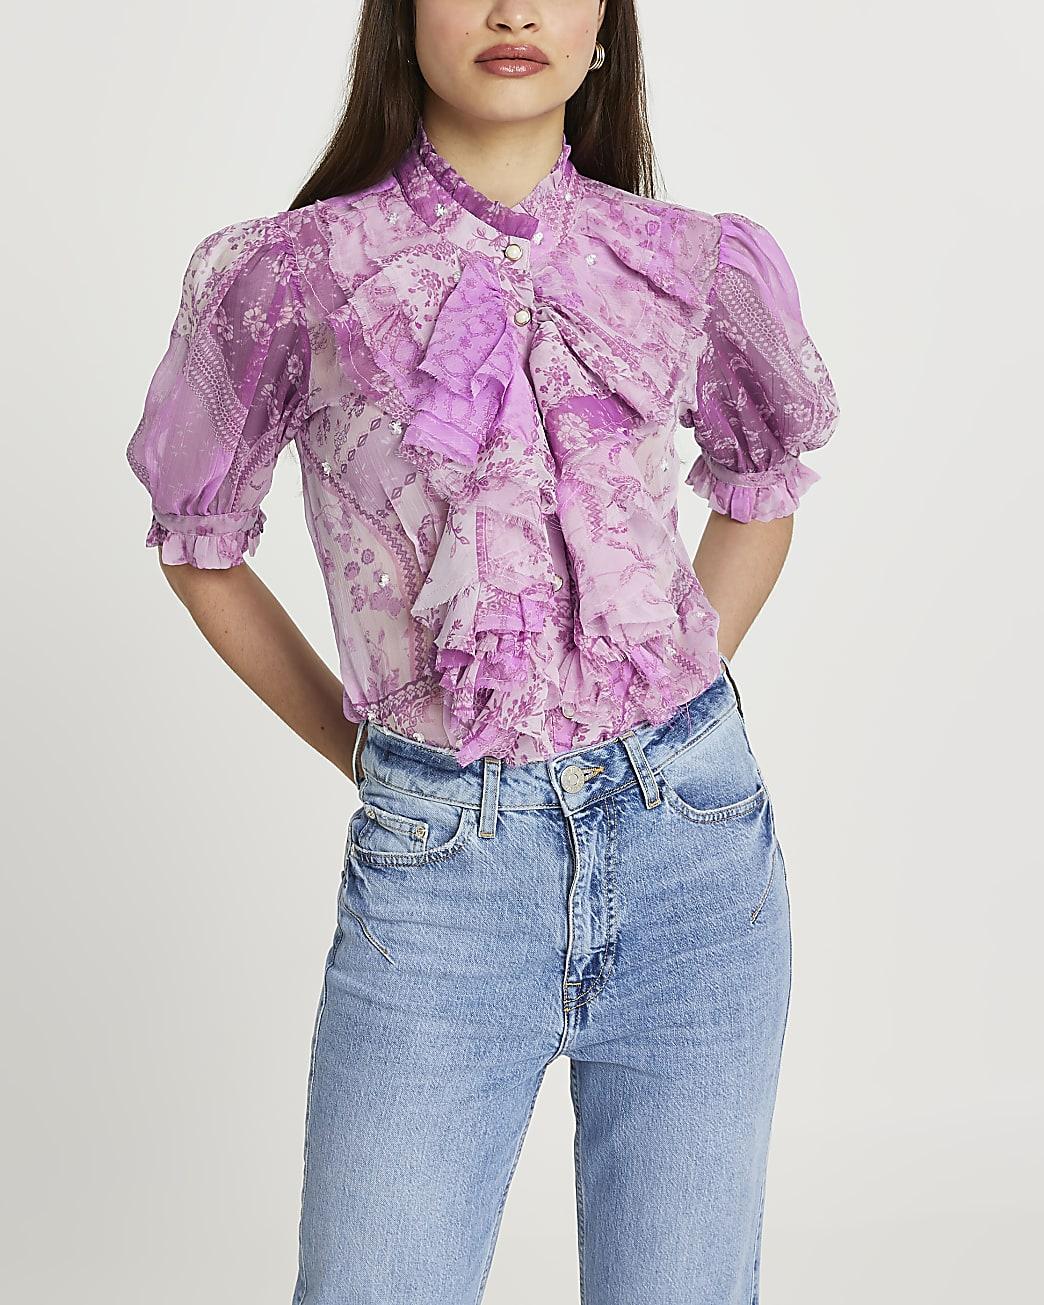 Purple ruffle embellished blouse top